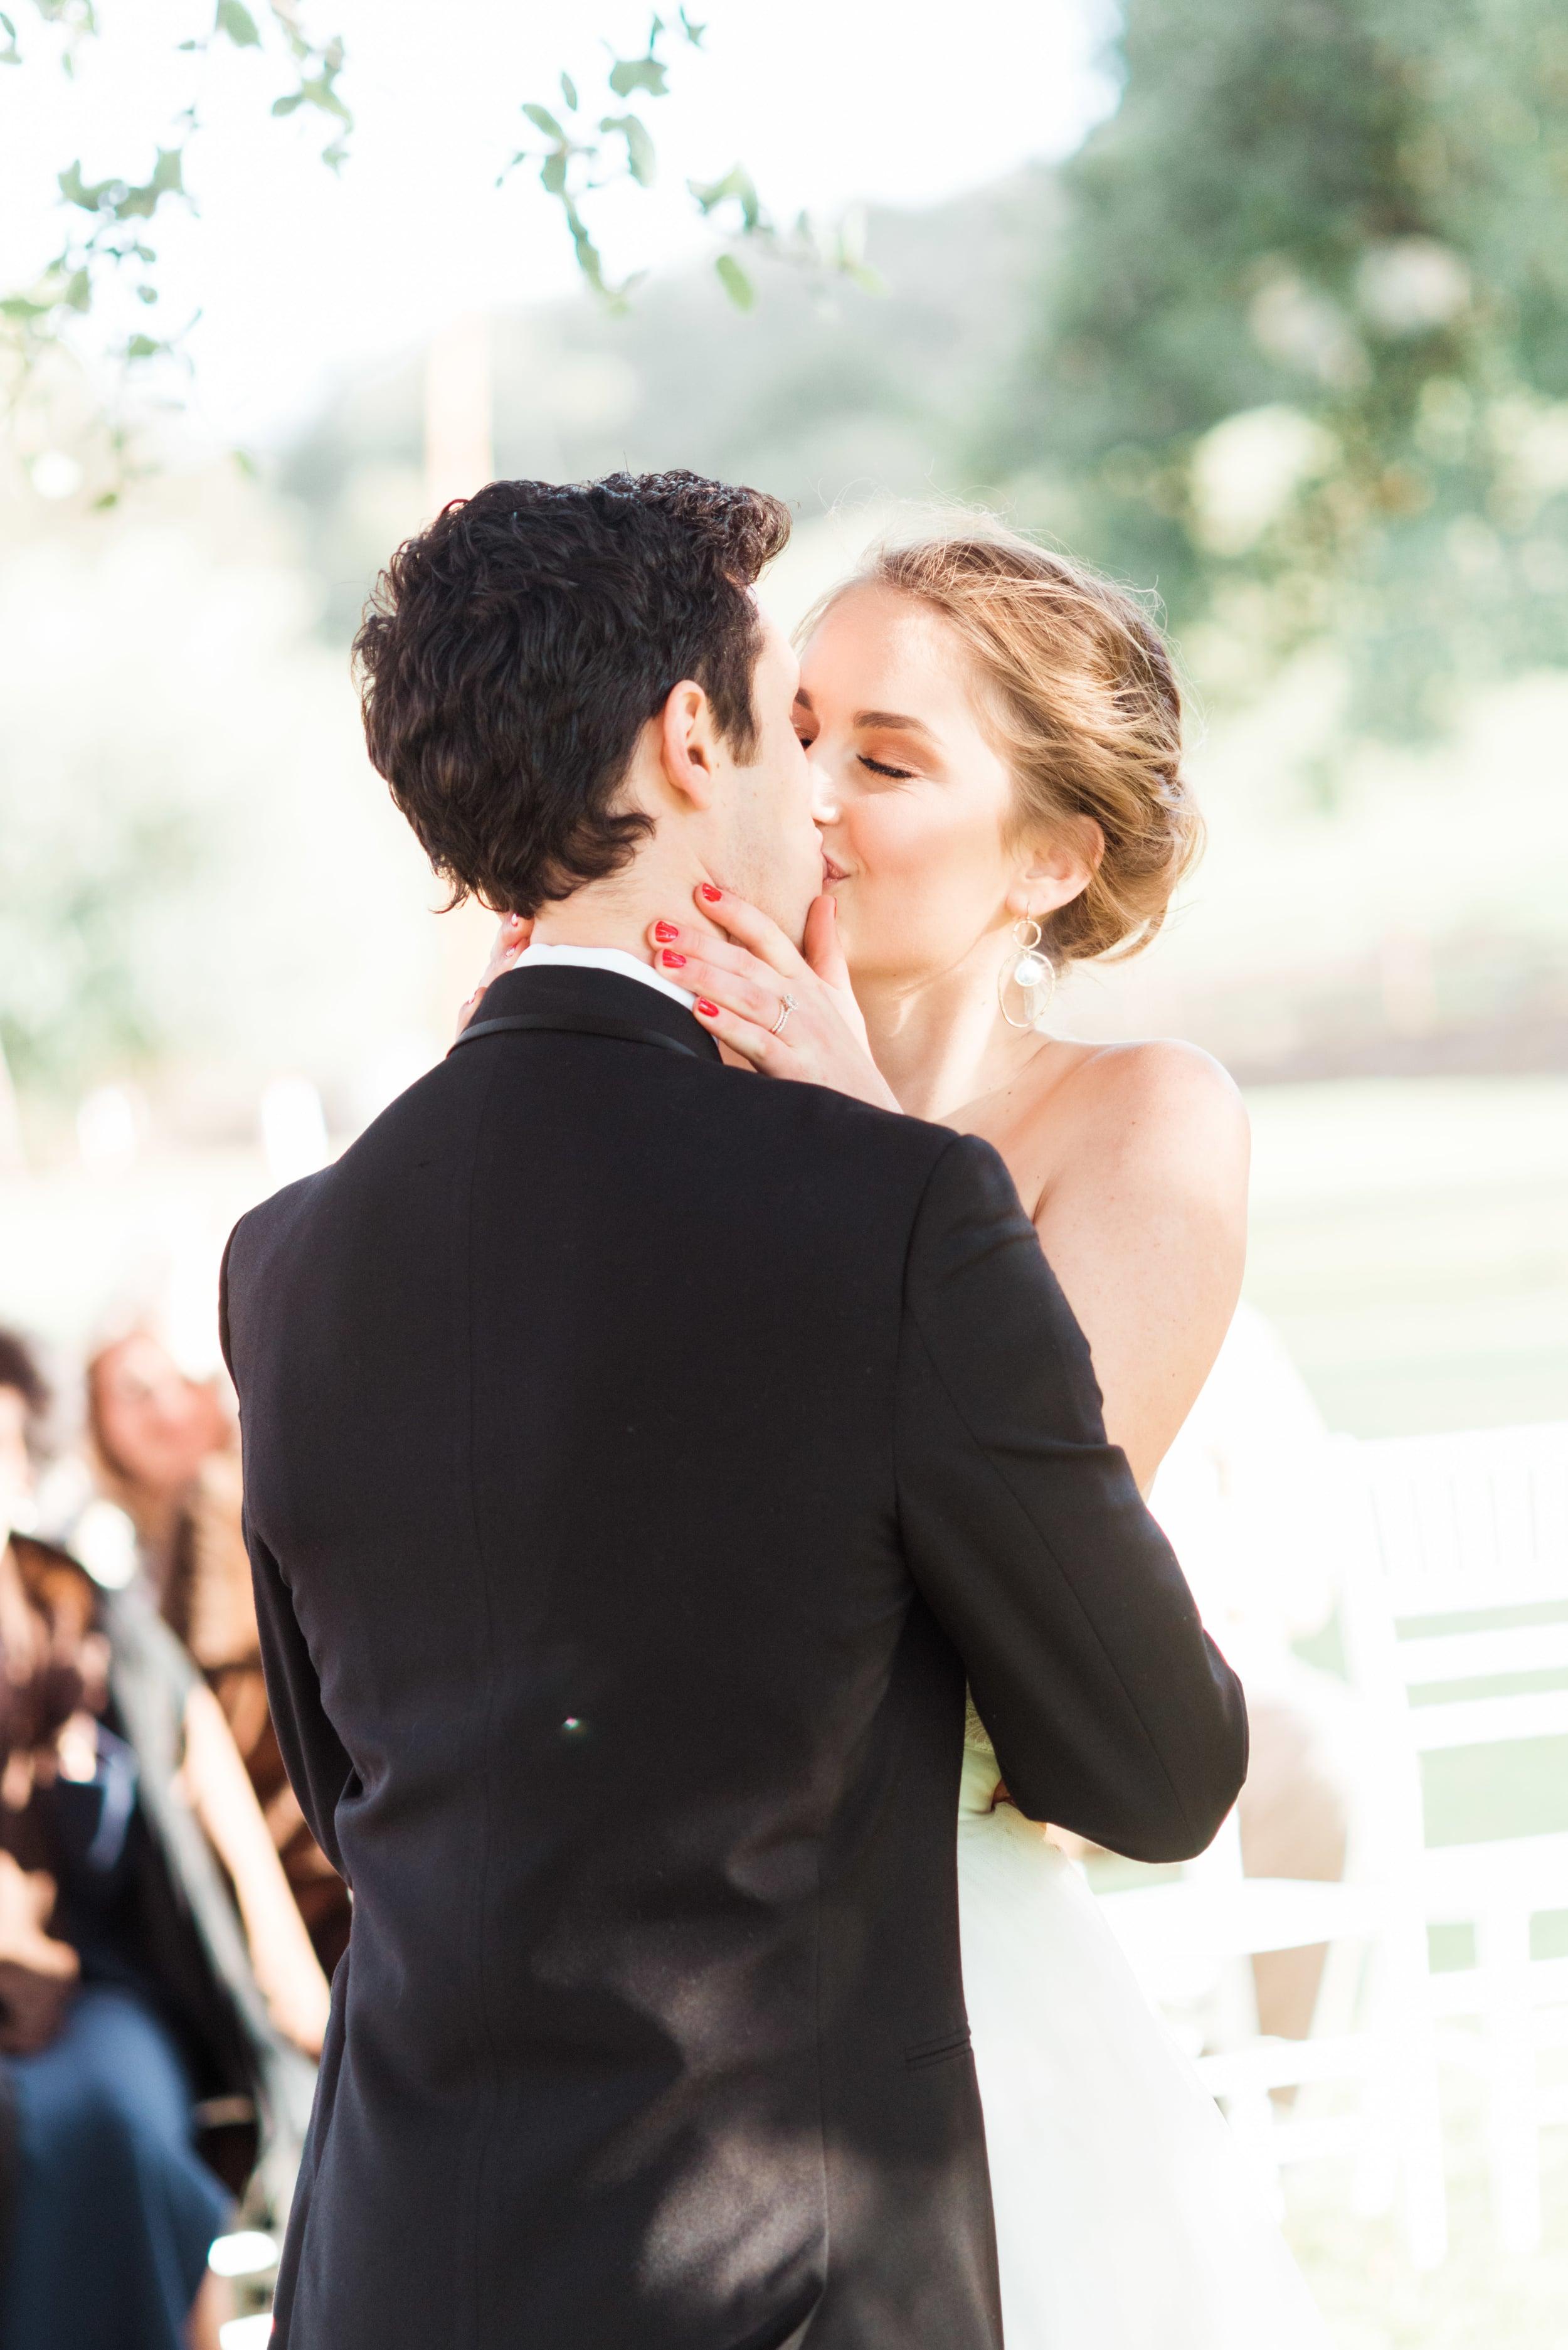 Natalie_Schutt_Photography_Winter_Wedding_San_Luis_Obispo-142.jpg